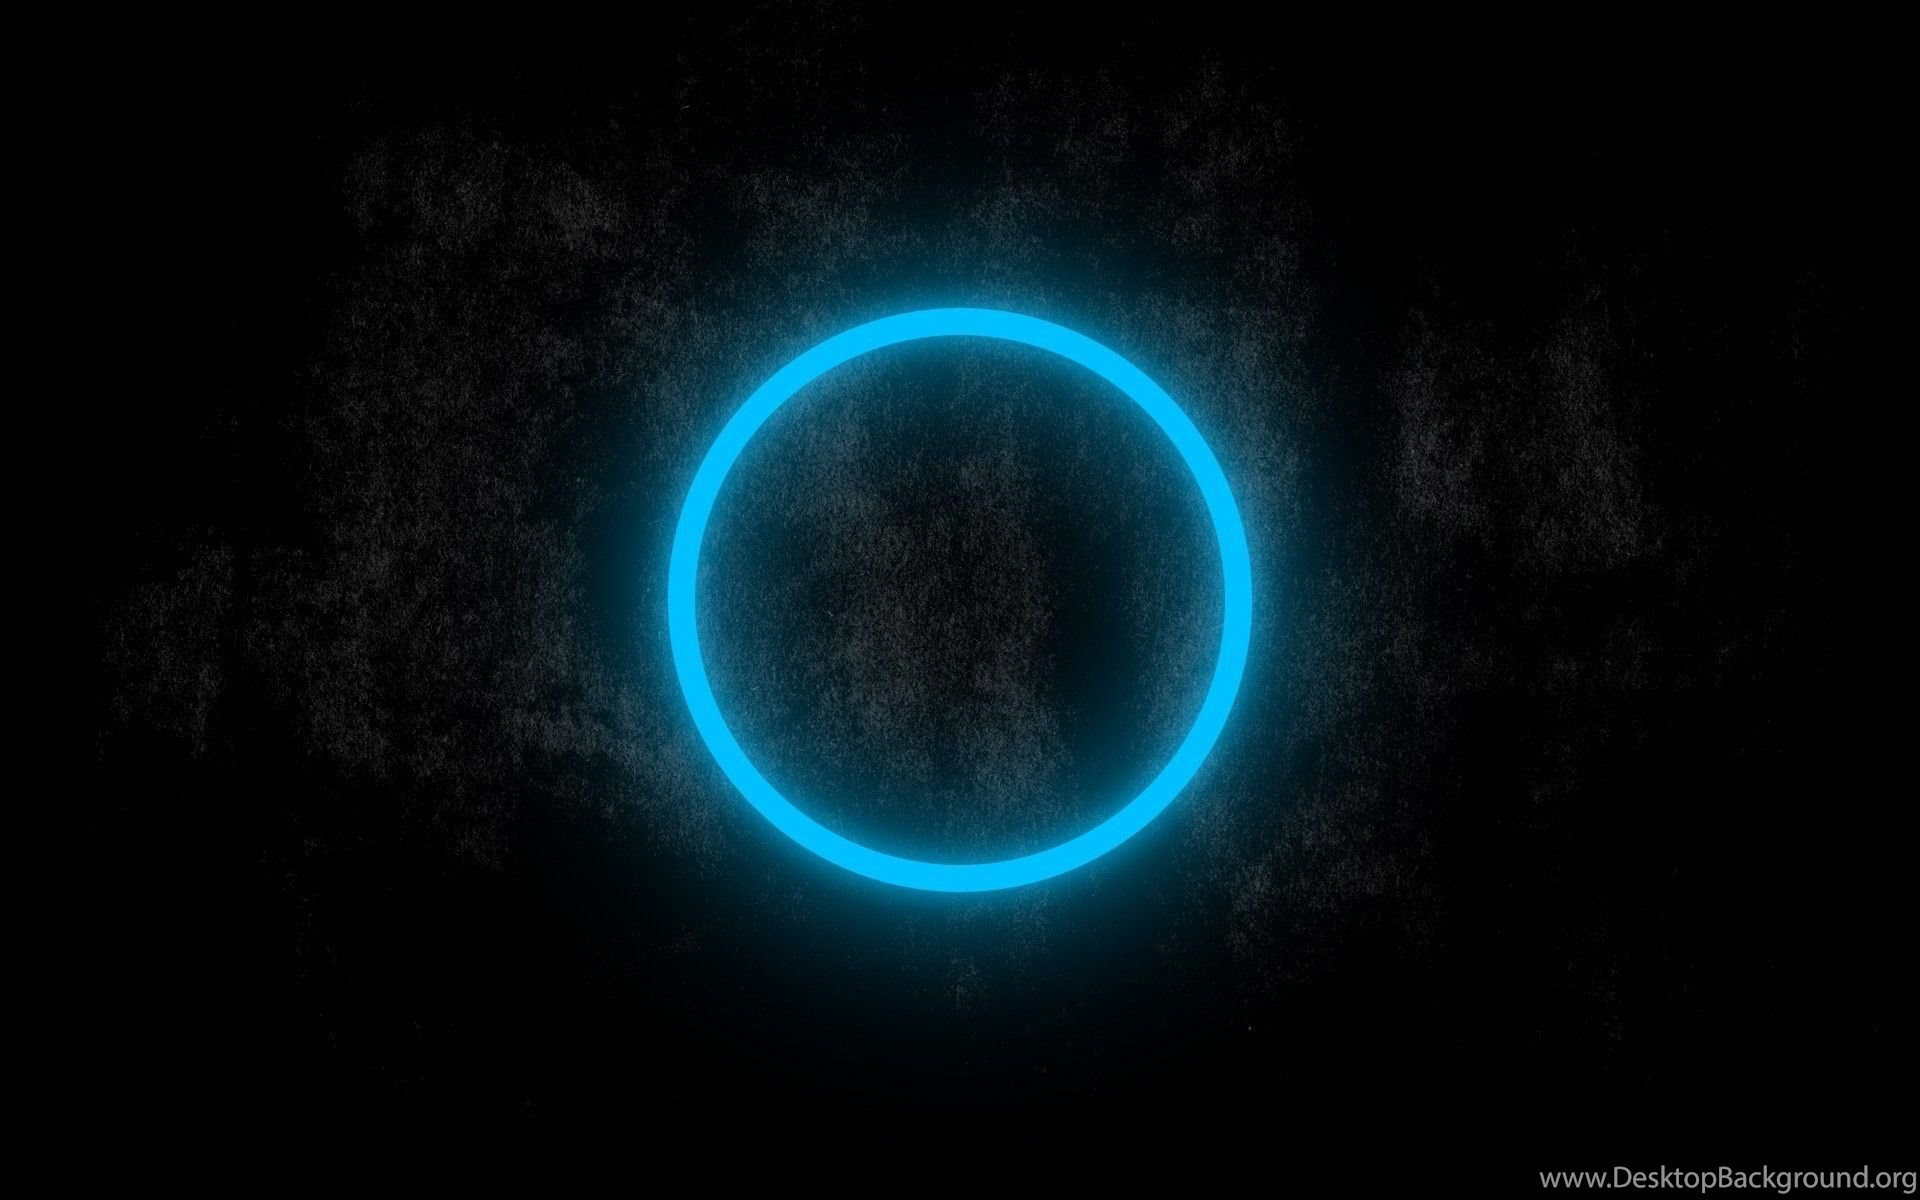 Blue Neon Circle Glowing In The Dark Wallpapers 23834 Desktop